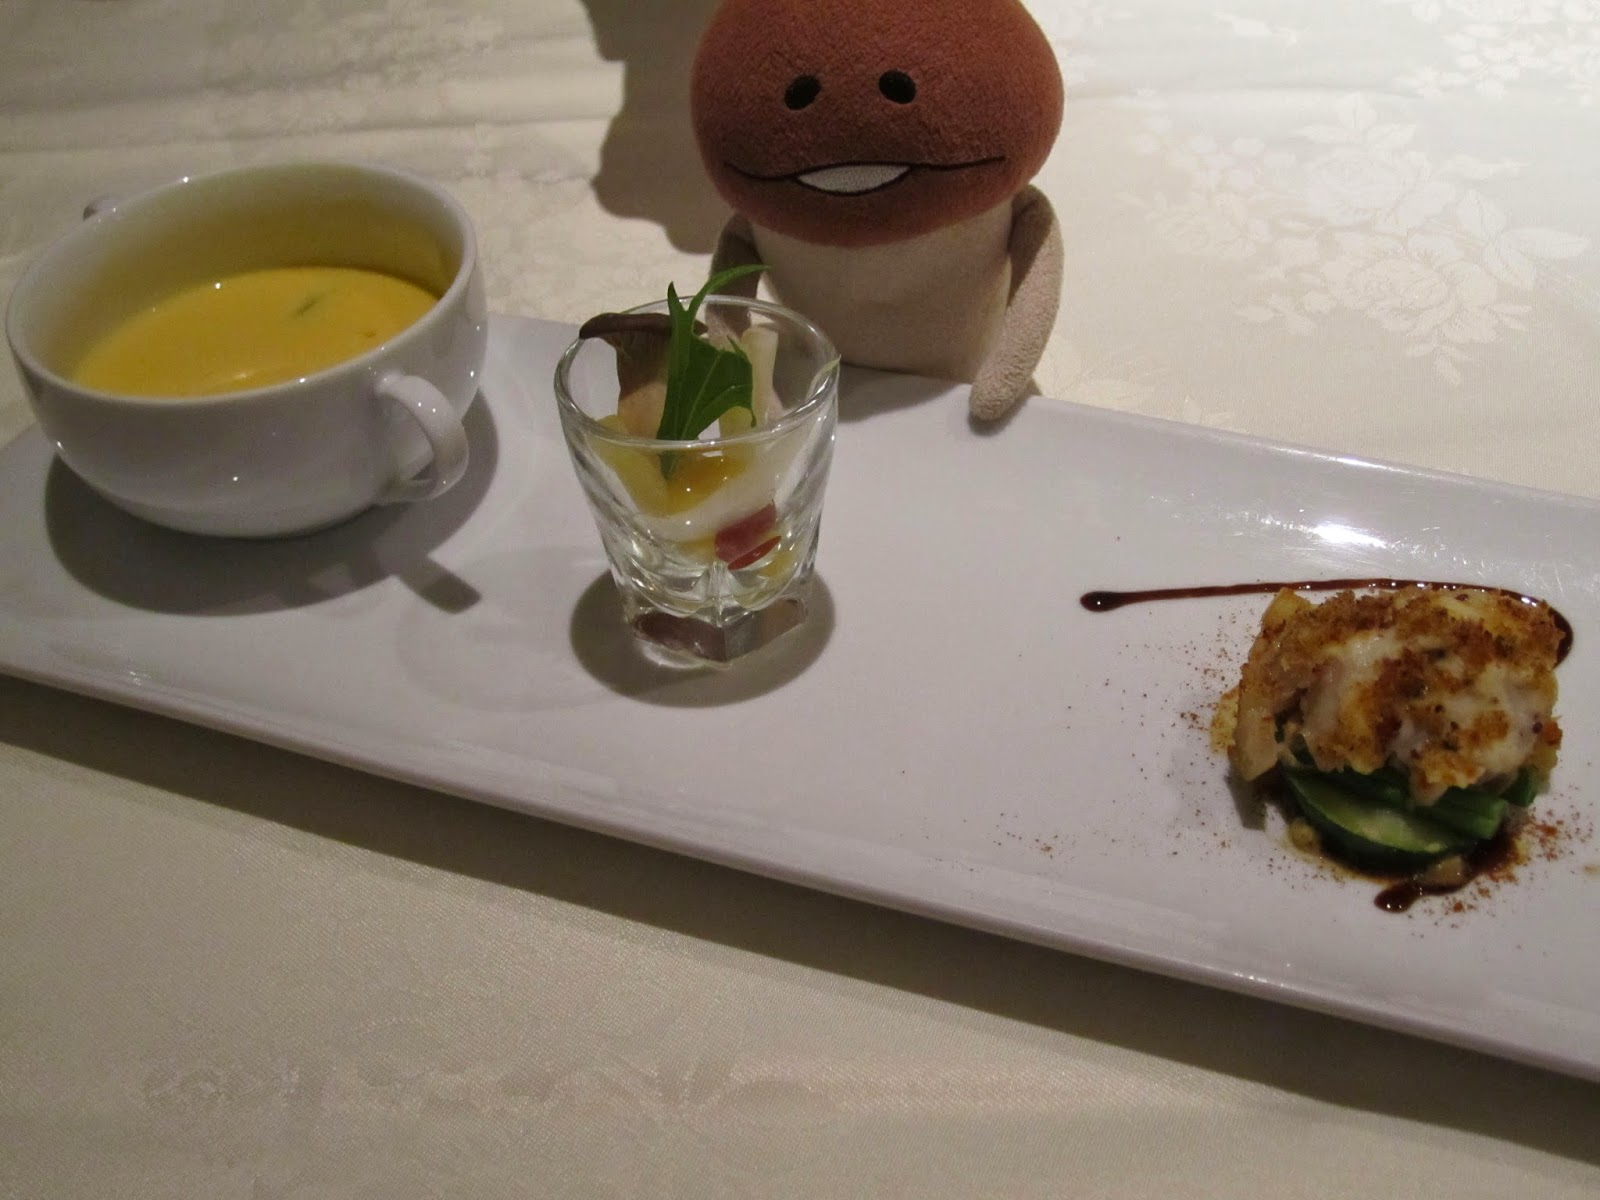 Hotel Neuschloss Otaru Blau Kuste turbot (a type of flatfish) gratin and carrot soup